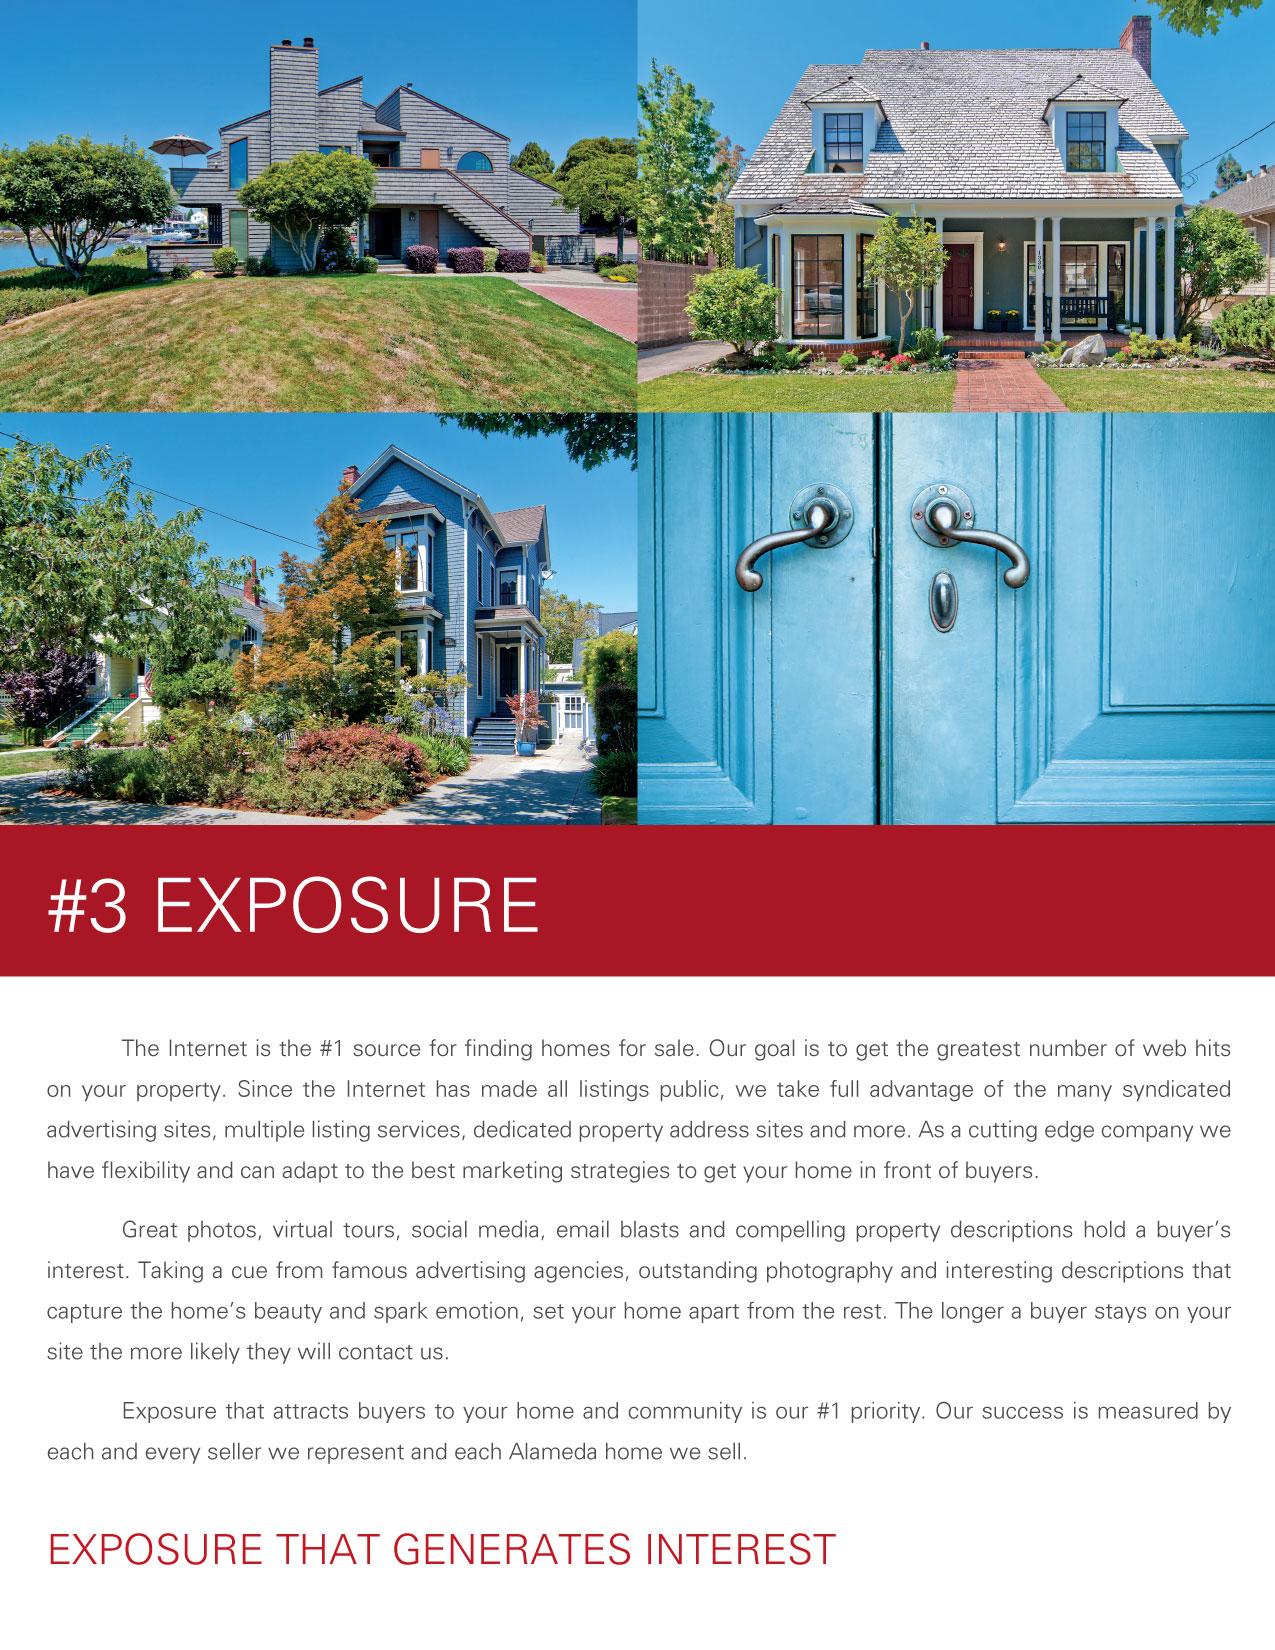 Listing Presentation - #3 Exposure